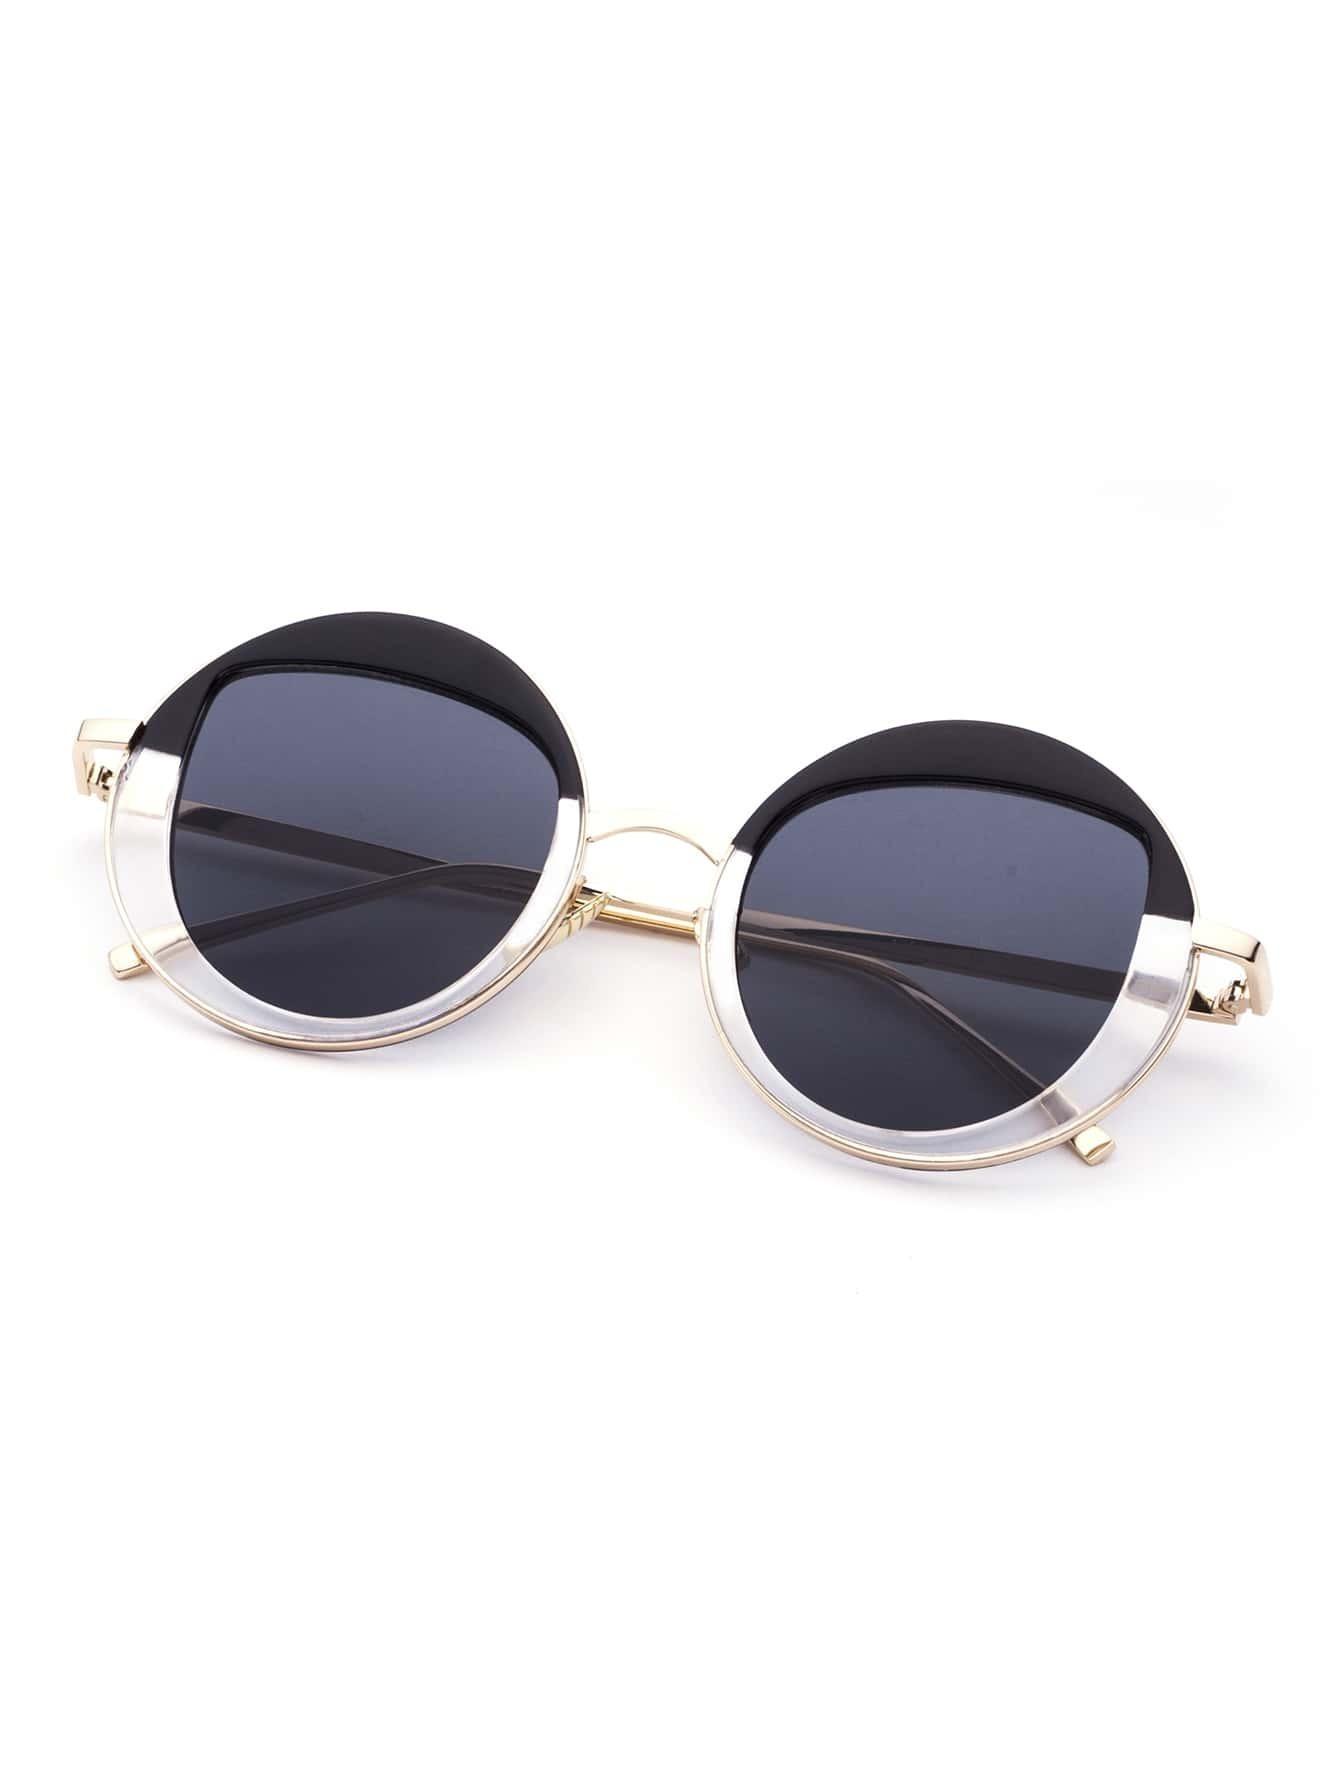 Golden Frame Black Sunglasses : Black And Gold Frame Round Design Sunglasses